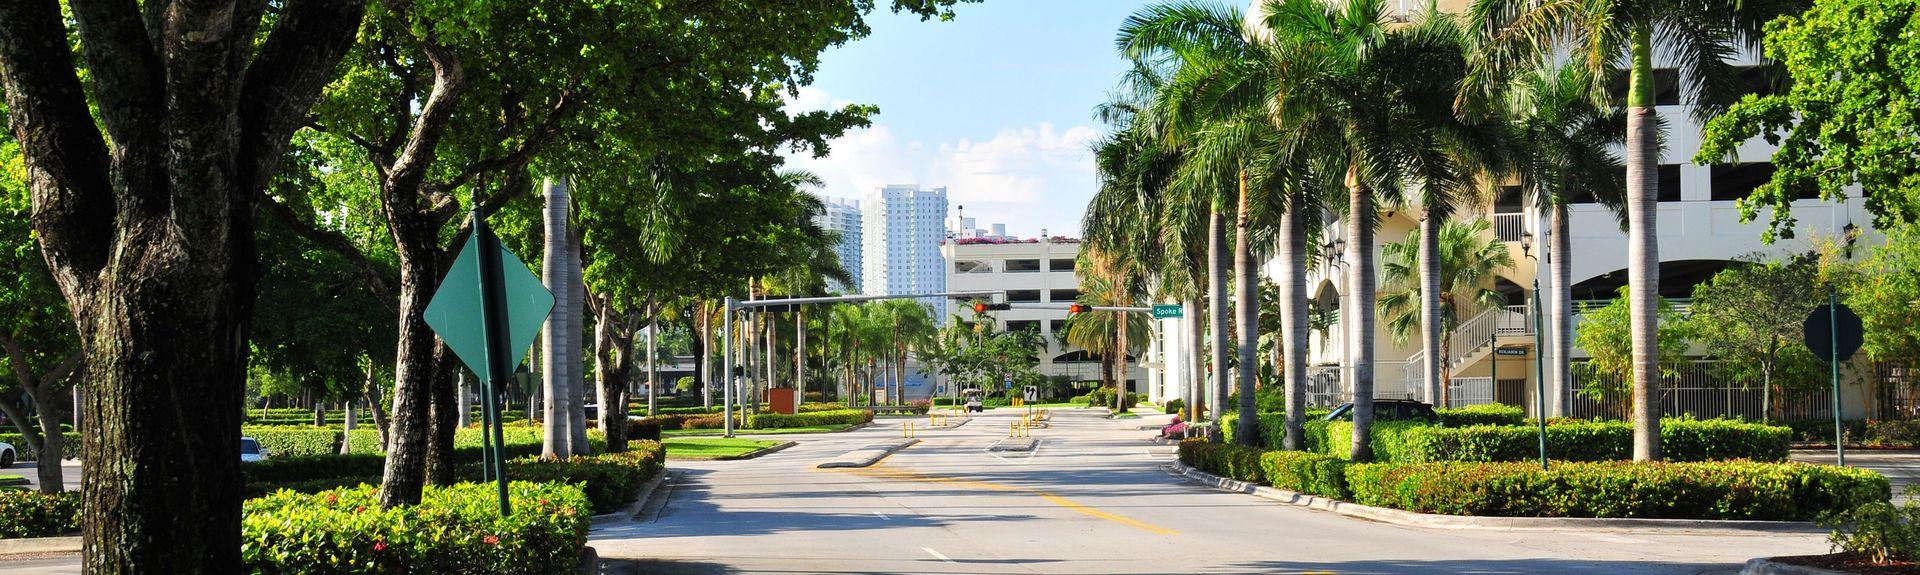 Aventura, FL, USA